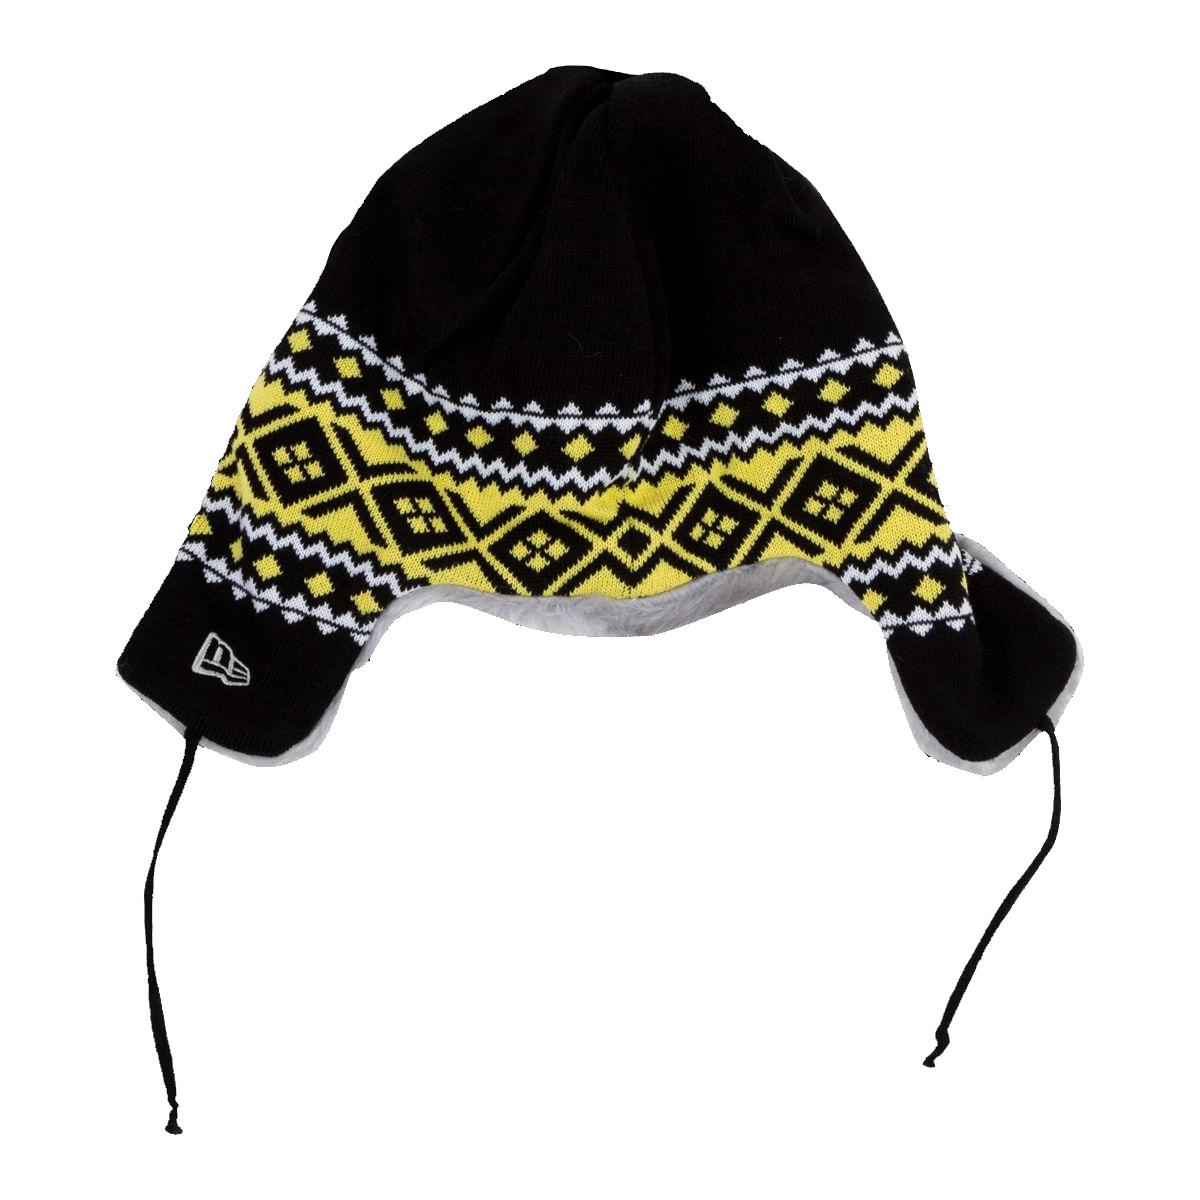 Sean Price New Era Trapper Knit Hat